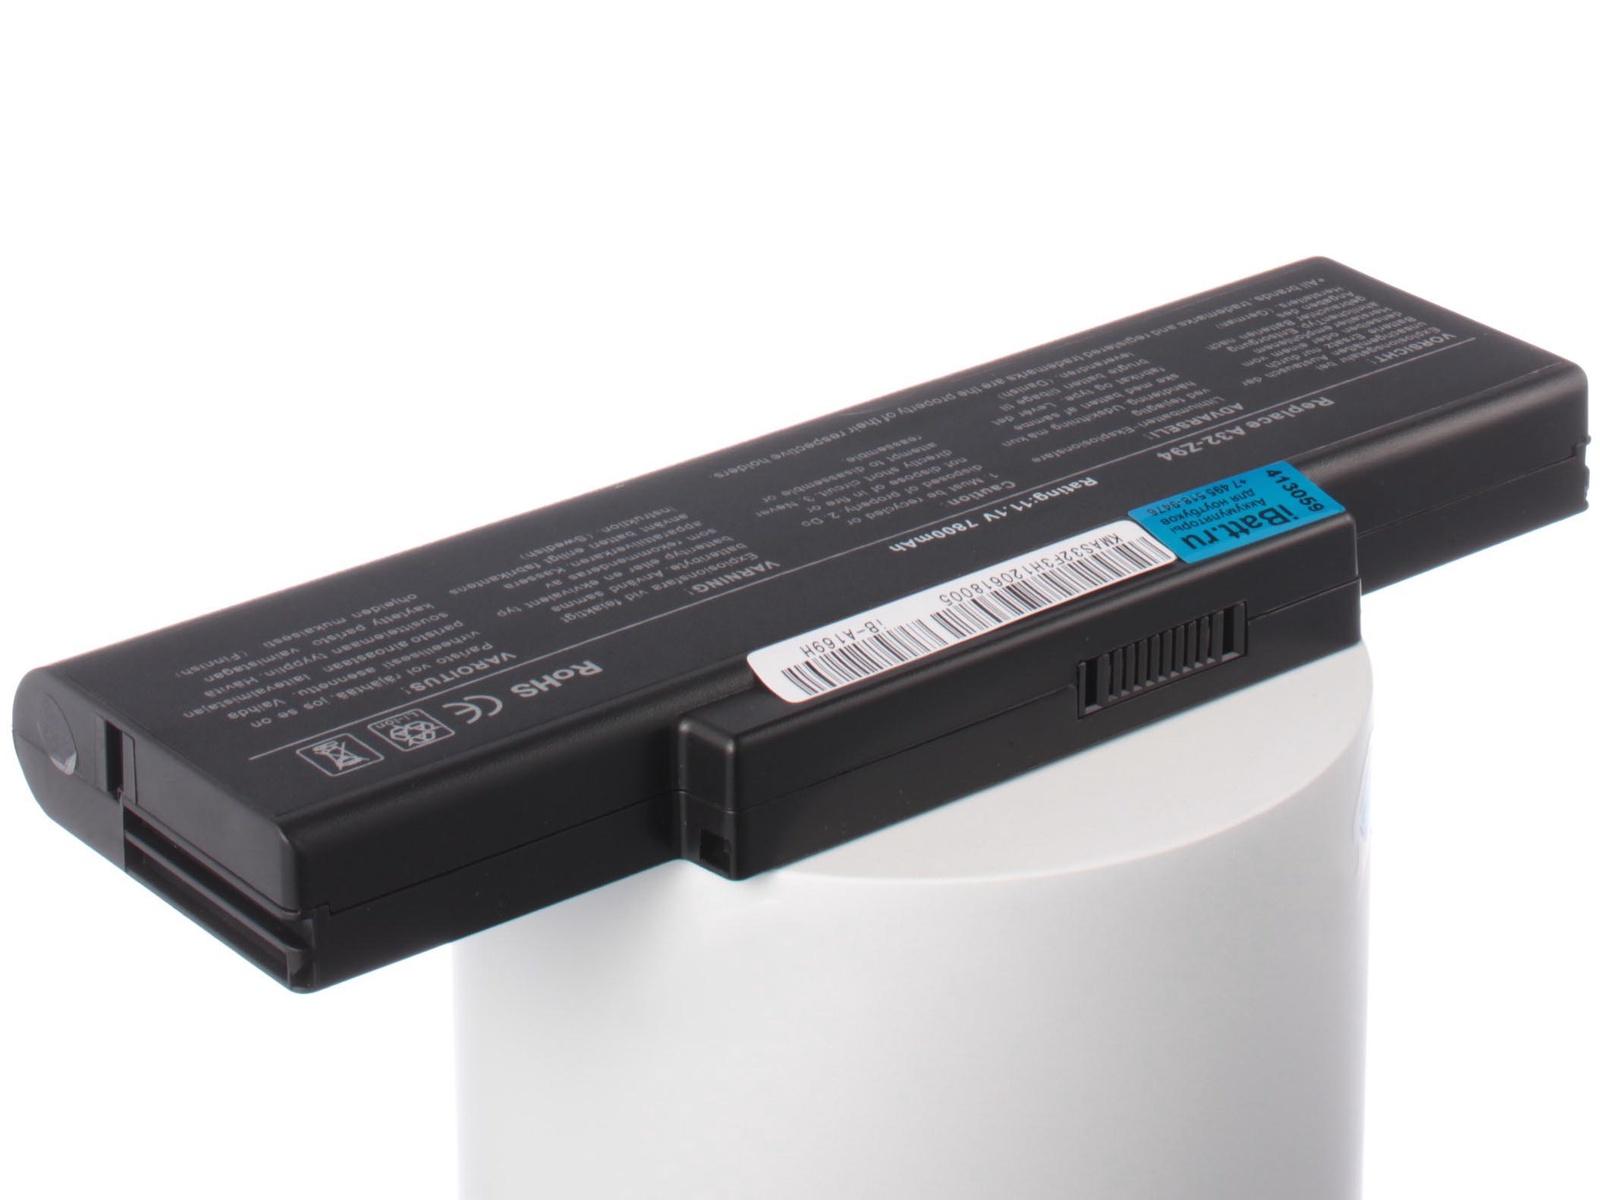 Аккумулятор для ноутбука iBatt Asus A32-F3, A33-F3, A32-F2, BAT-F3, 90-NI11B1000, 15G10N353630, 70R-NI81B1000 аккумулятор для ноутбука hp compaq hstnn lb12 hstnn ib12 hstnn c02c hstnn ub12 hstnn ib27 nc4200 nc4400 tc4200 6cell tc4400 hstnn ib12